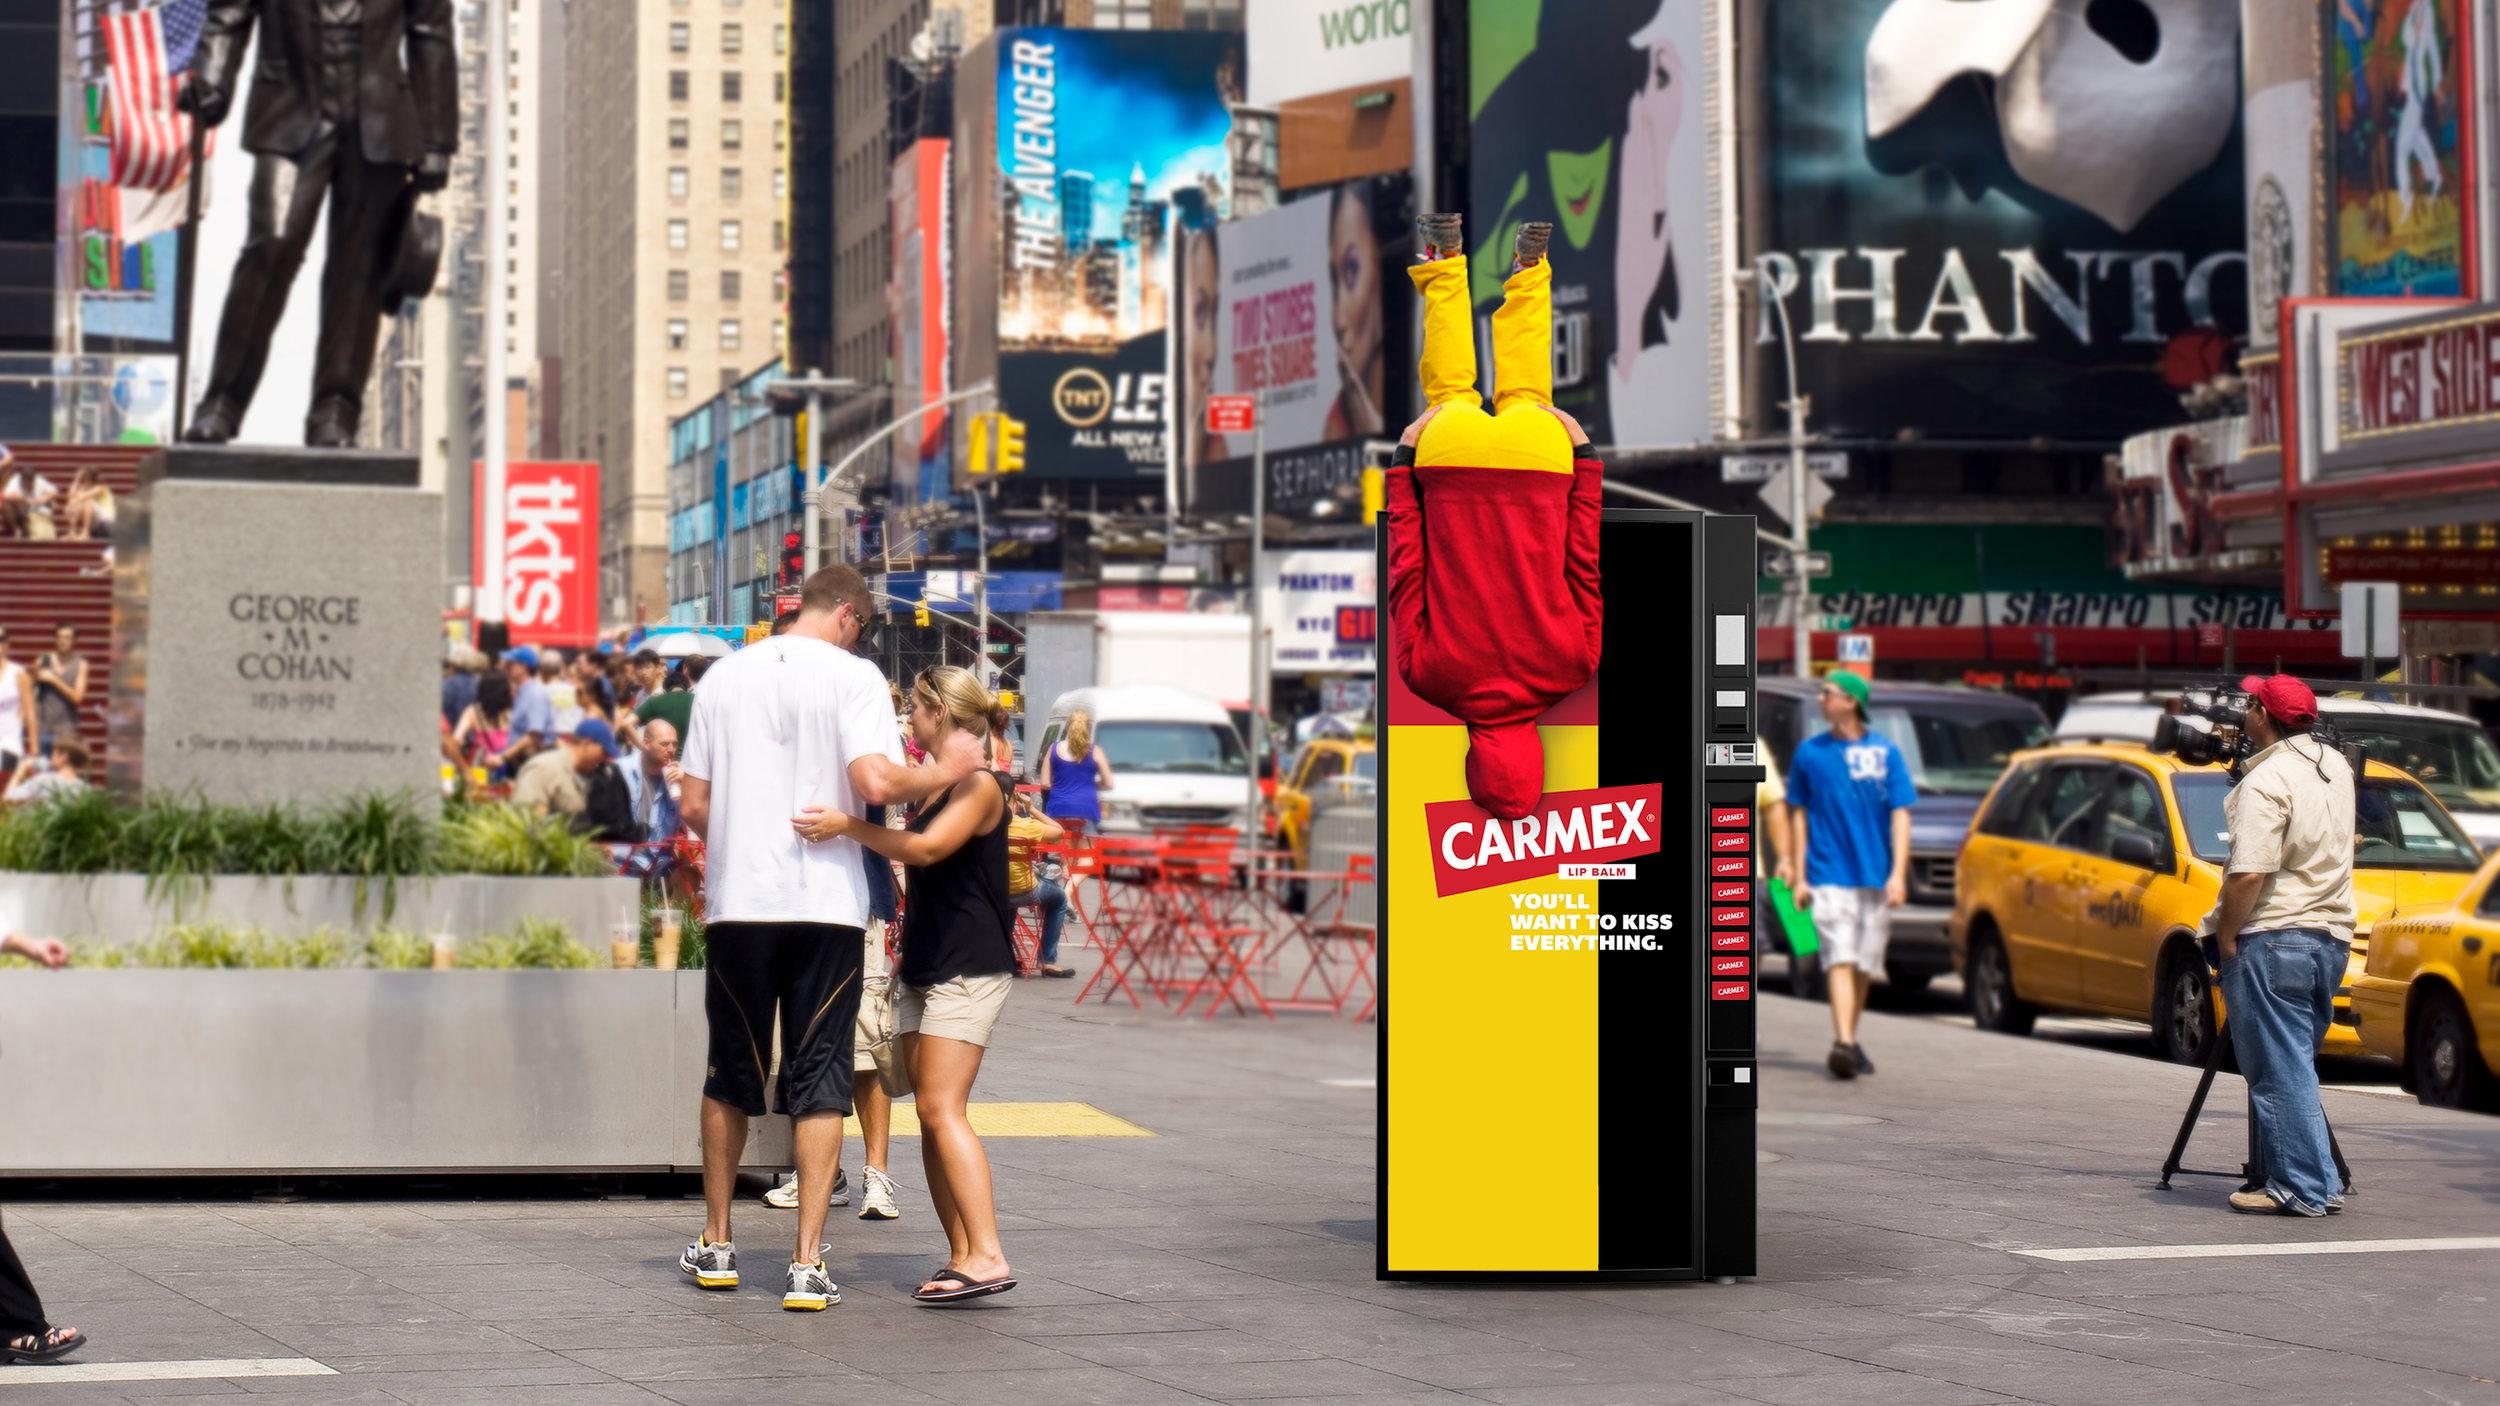 Carmex _ OOH _ Vending Machine.jpg